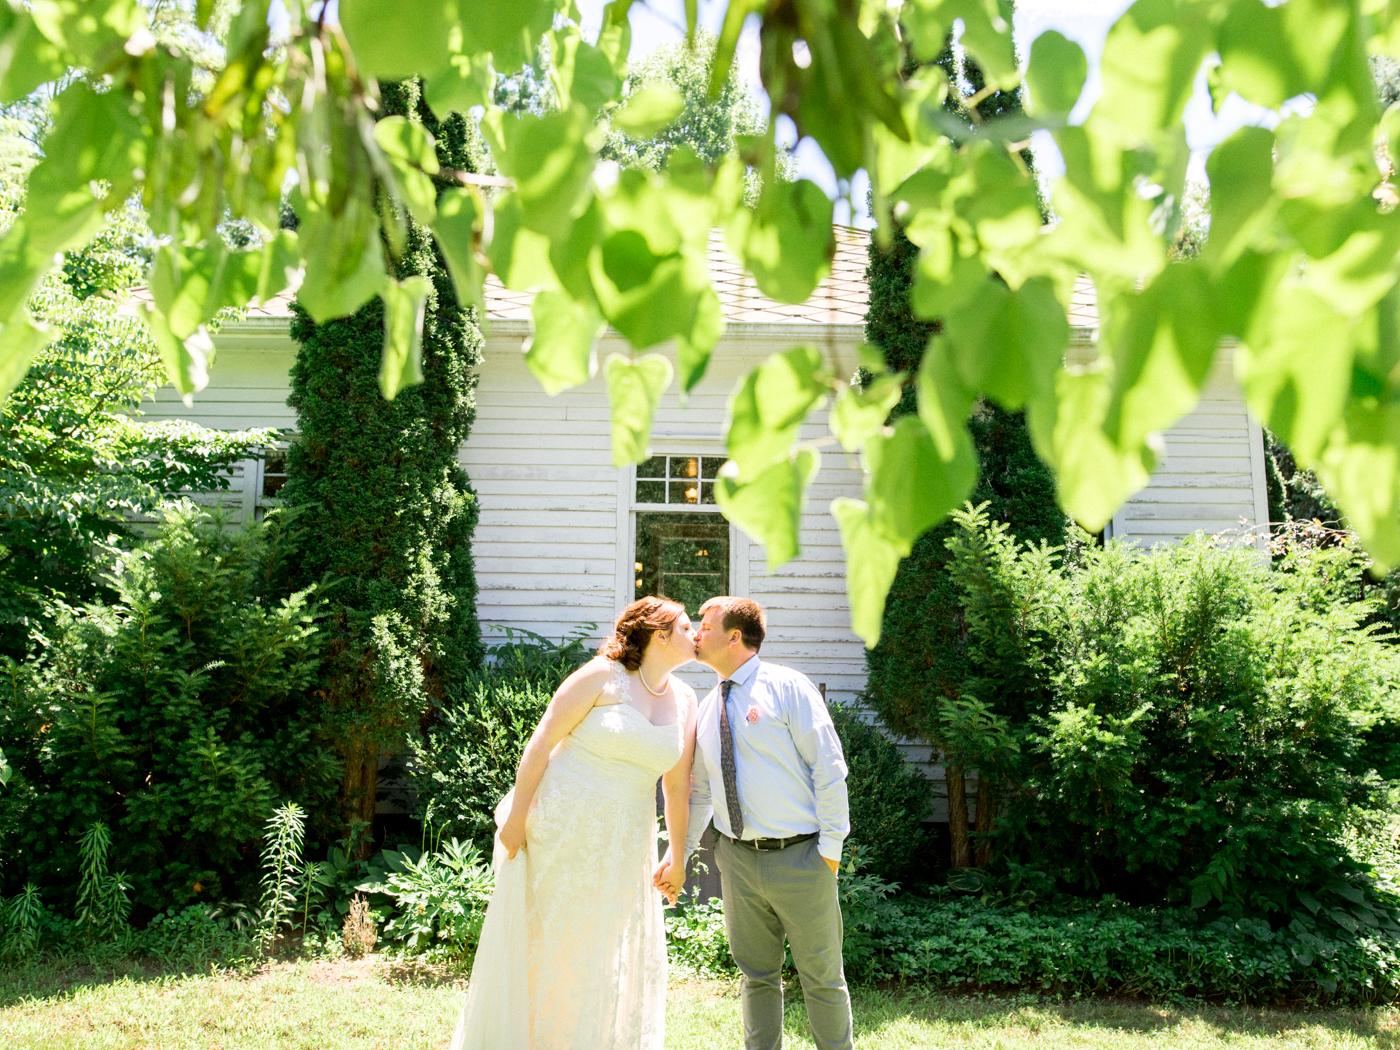 Chris & Carrie's Cranberry Creek Simcoe Port Dover Wedding Church Outdoor Summer Bright Hamilton Wedding Photography Niagara Aidan Hennebry Hush Hush Photography & Film-12.jpg